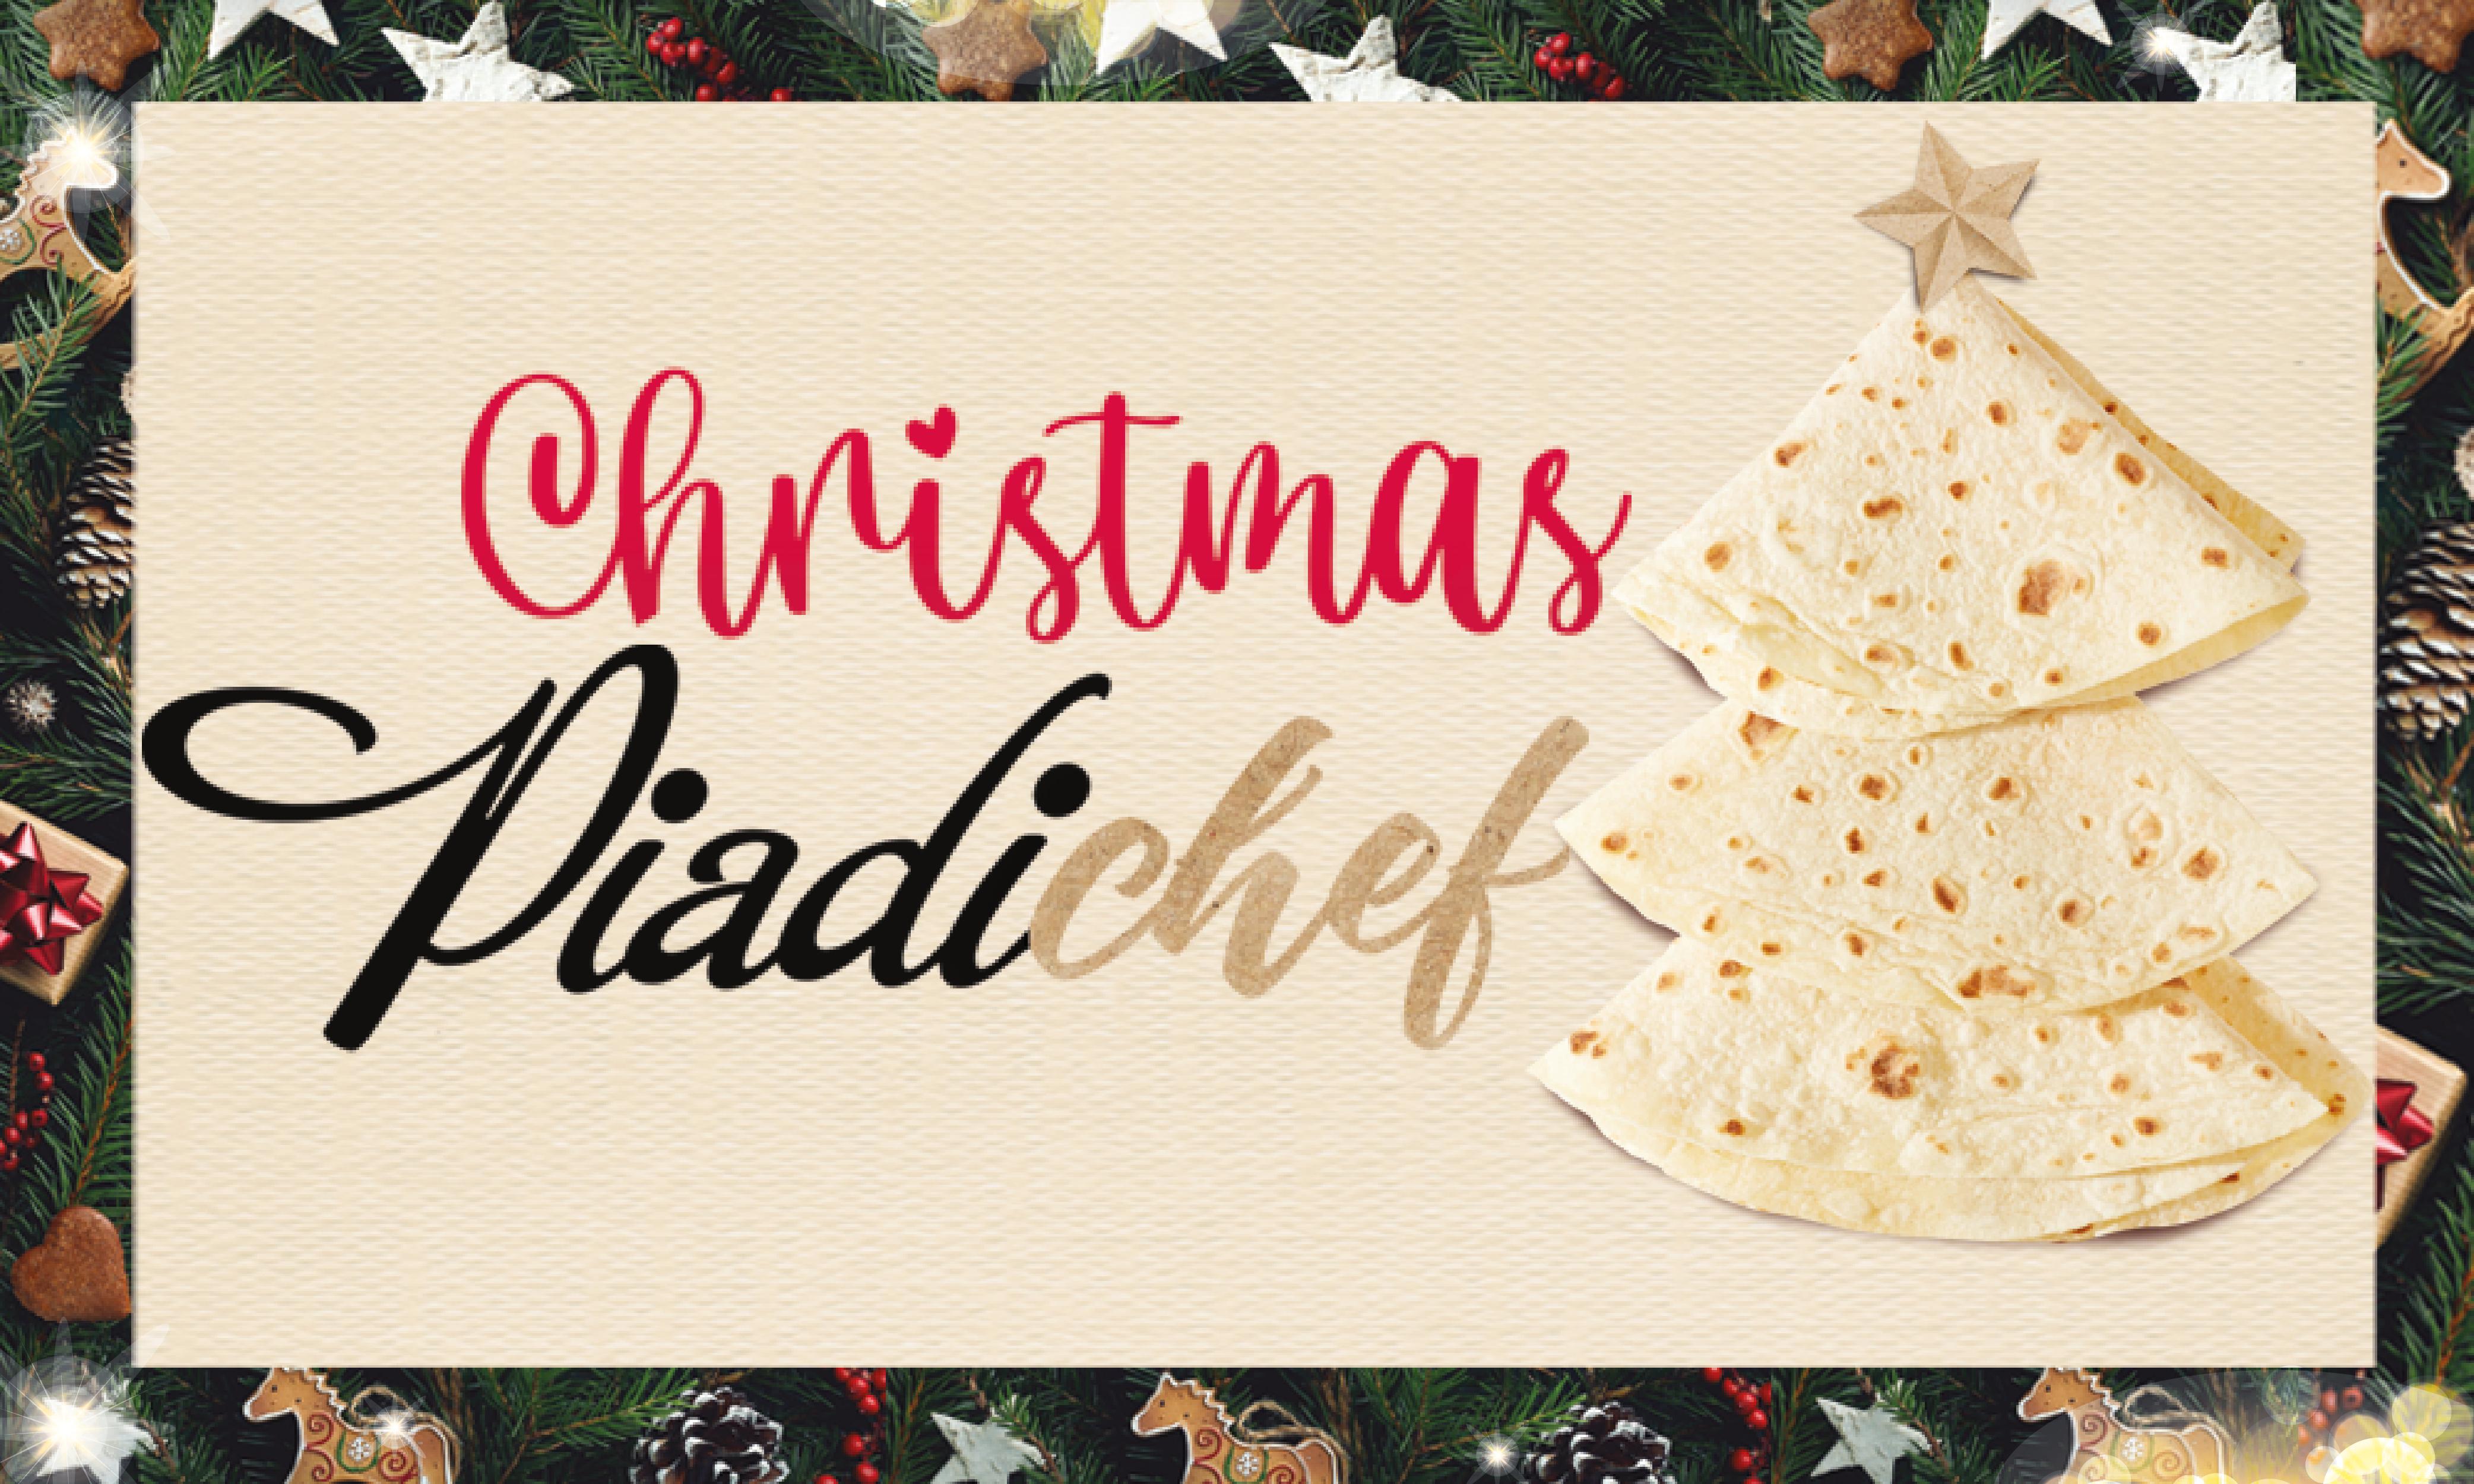 Christmas Piadichef